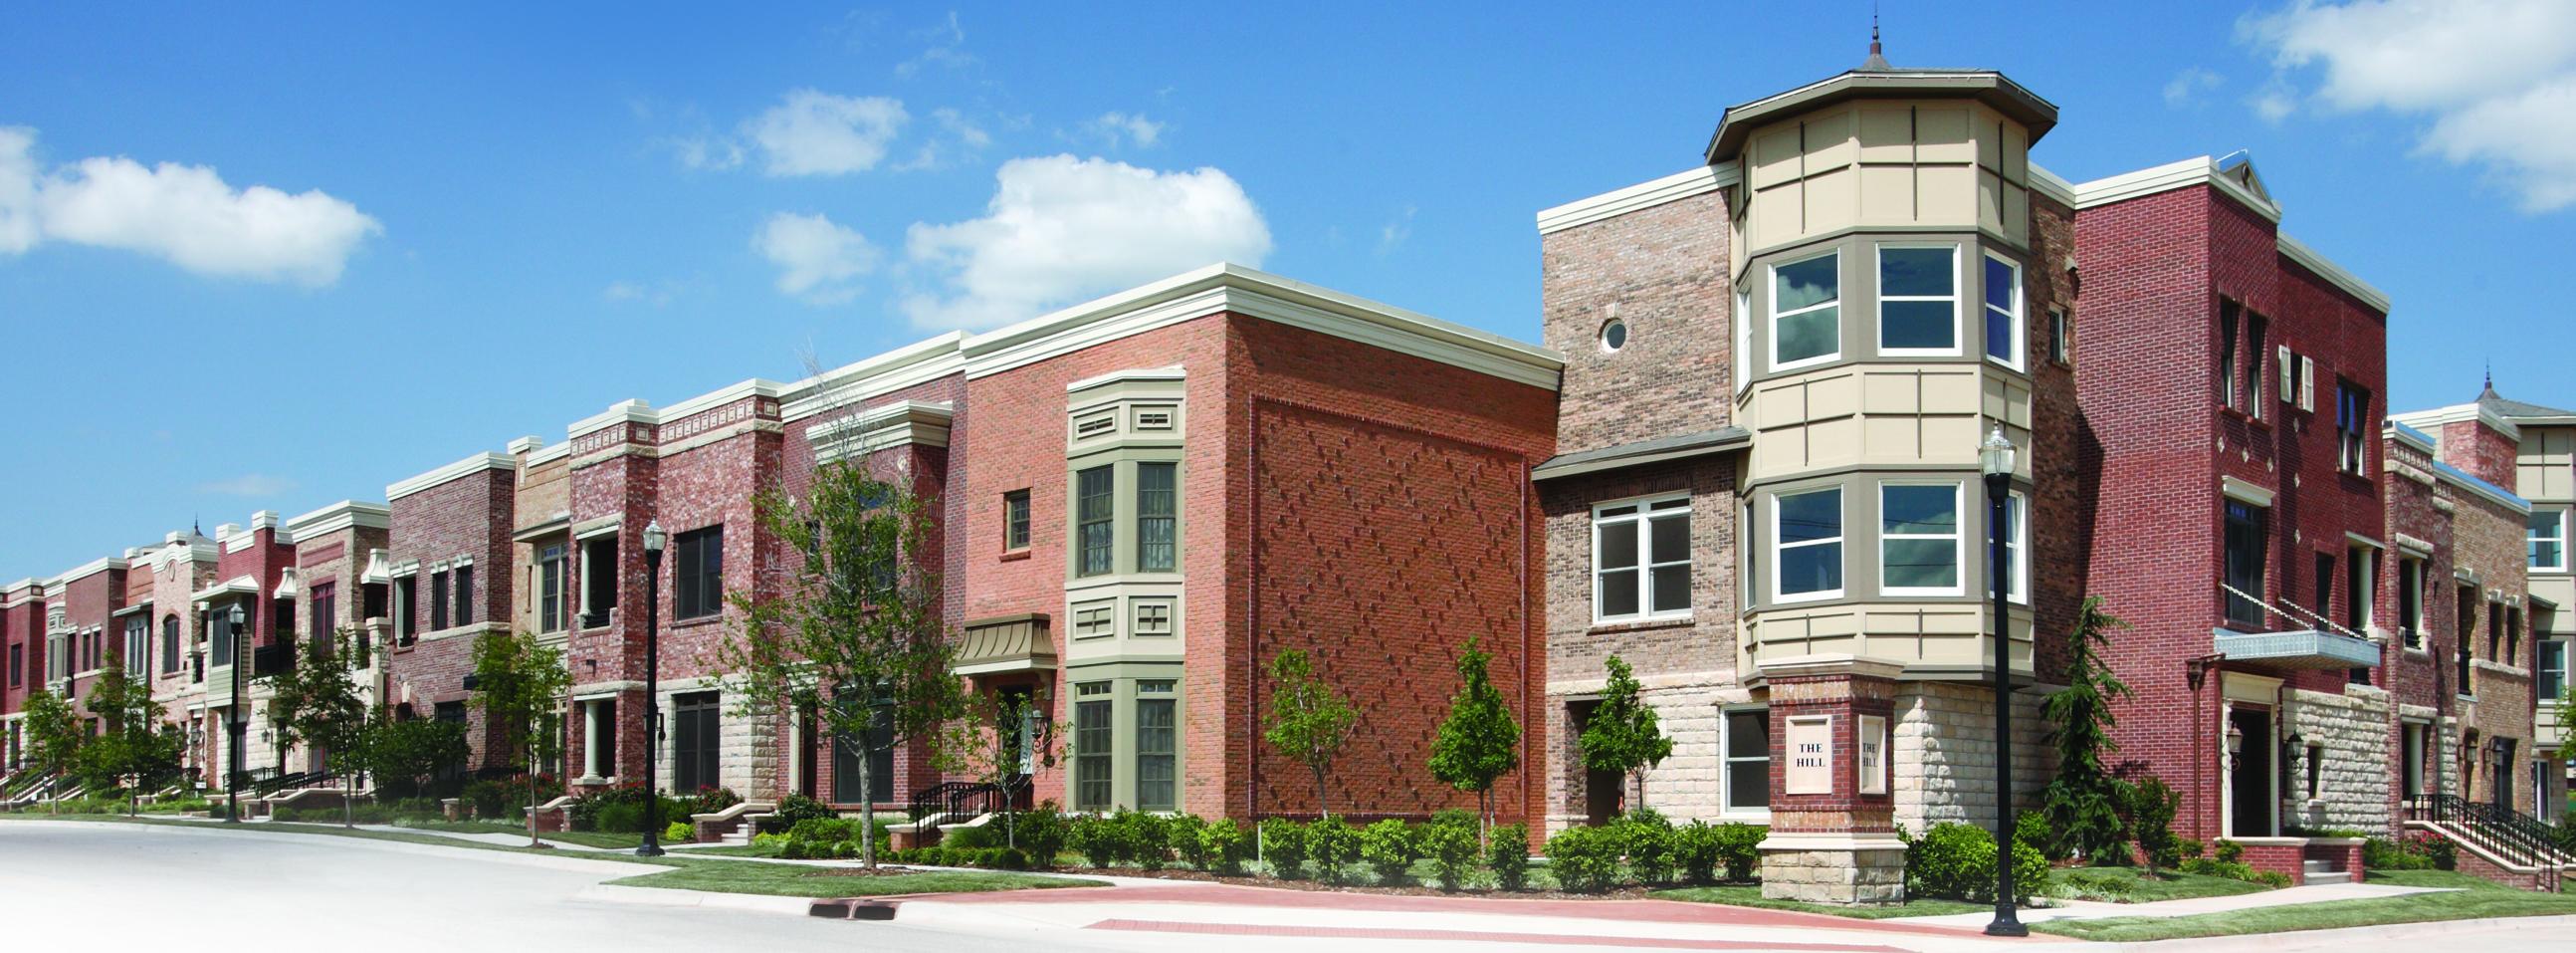 Oklahoma City Bricktown Homes Midtown Bricktown Lofts Homes for